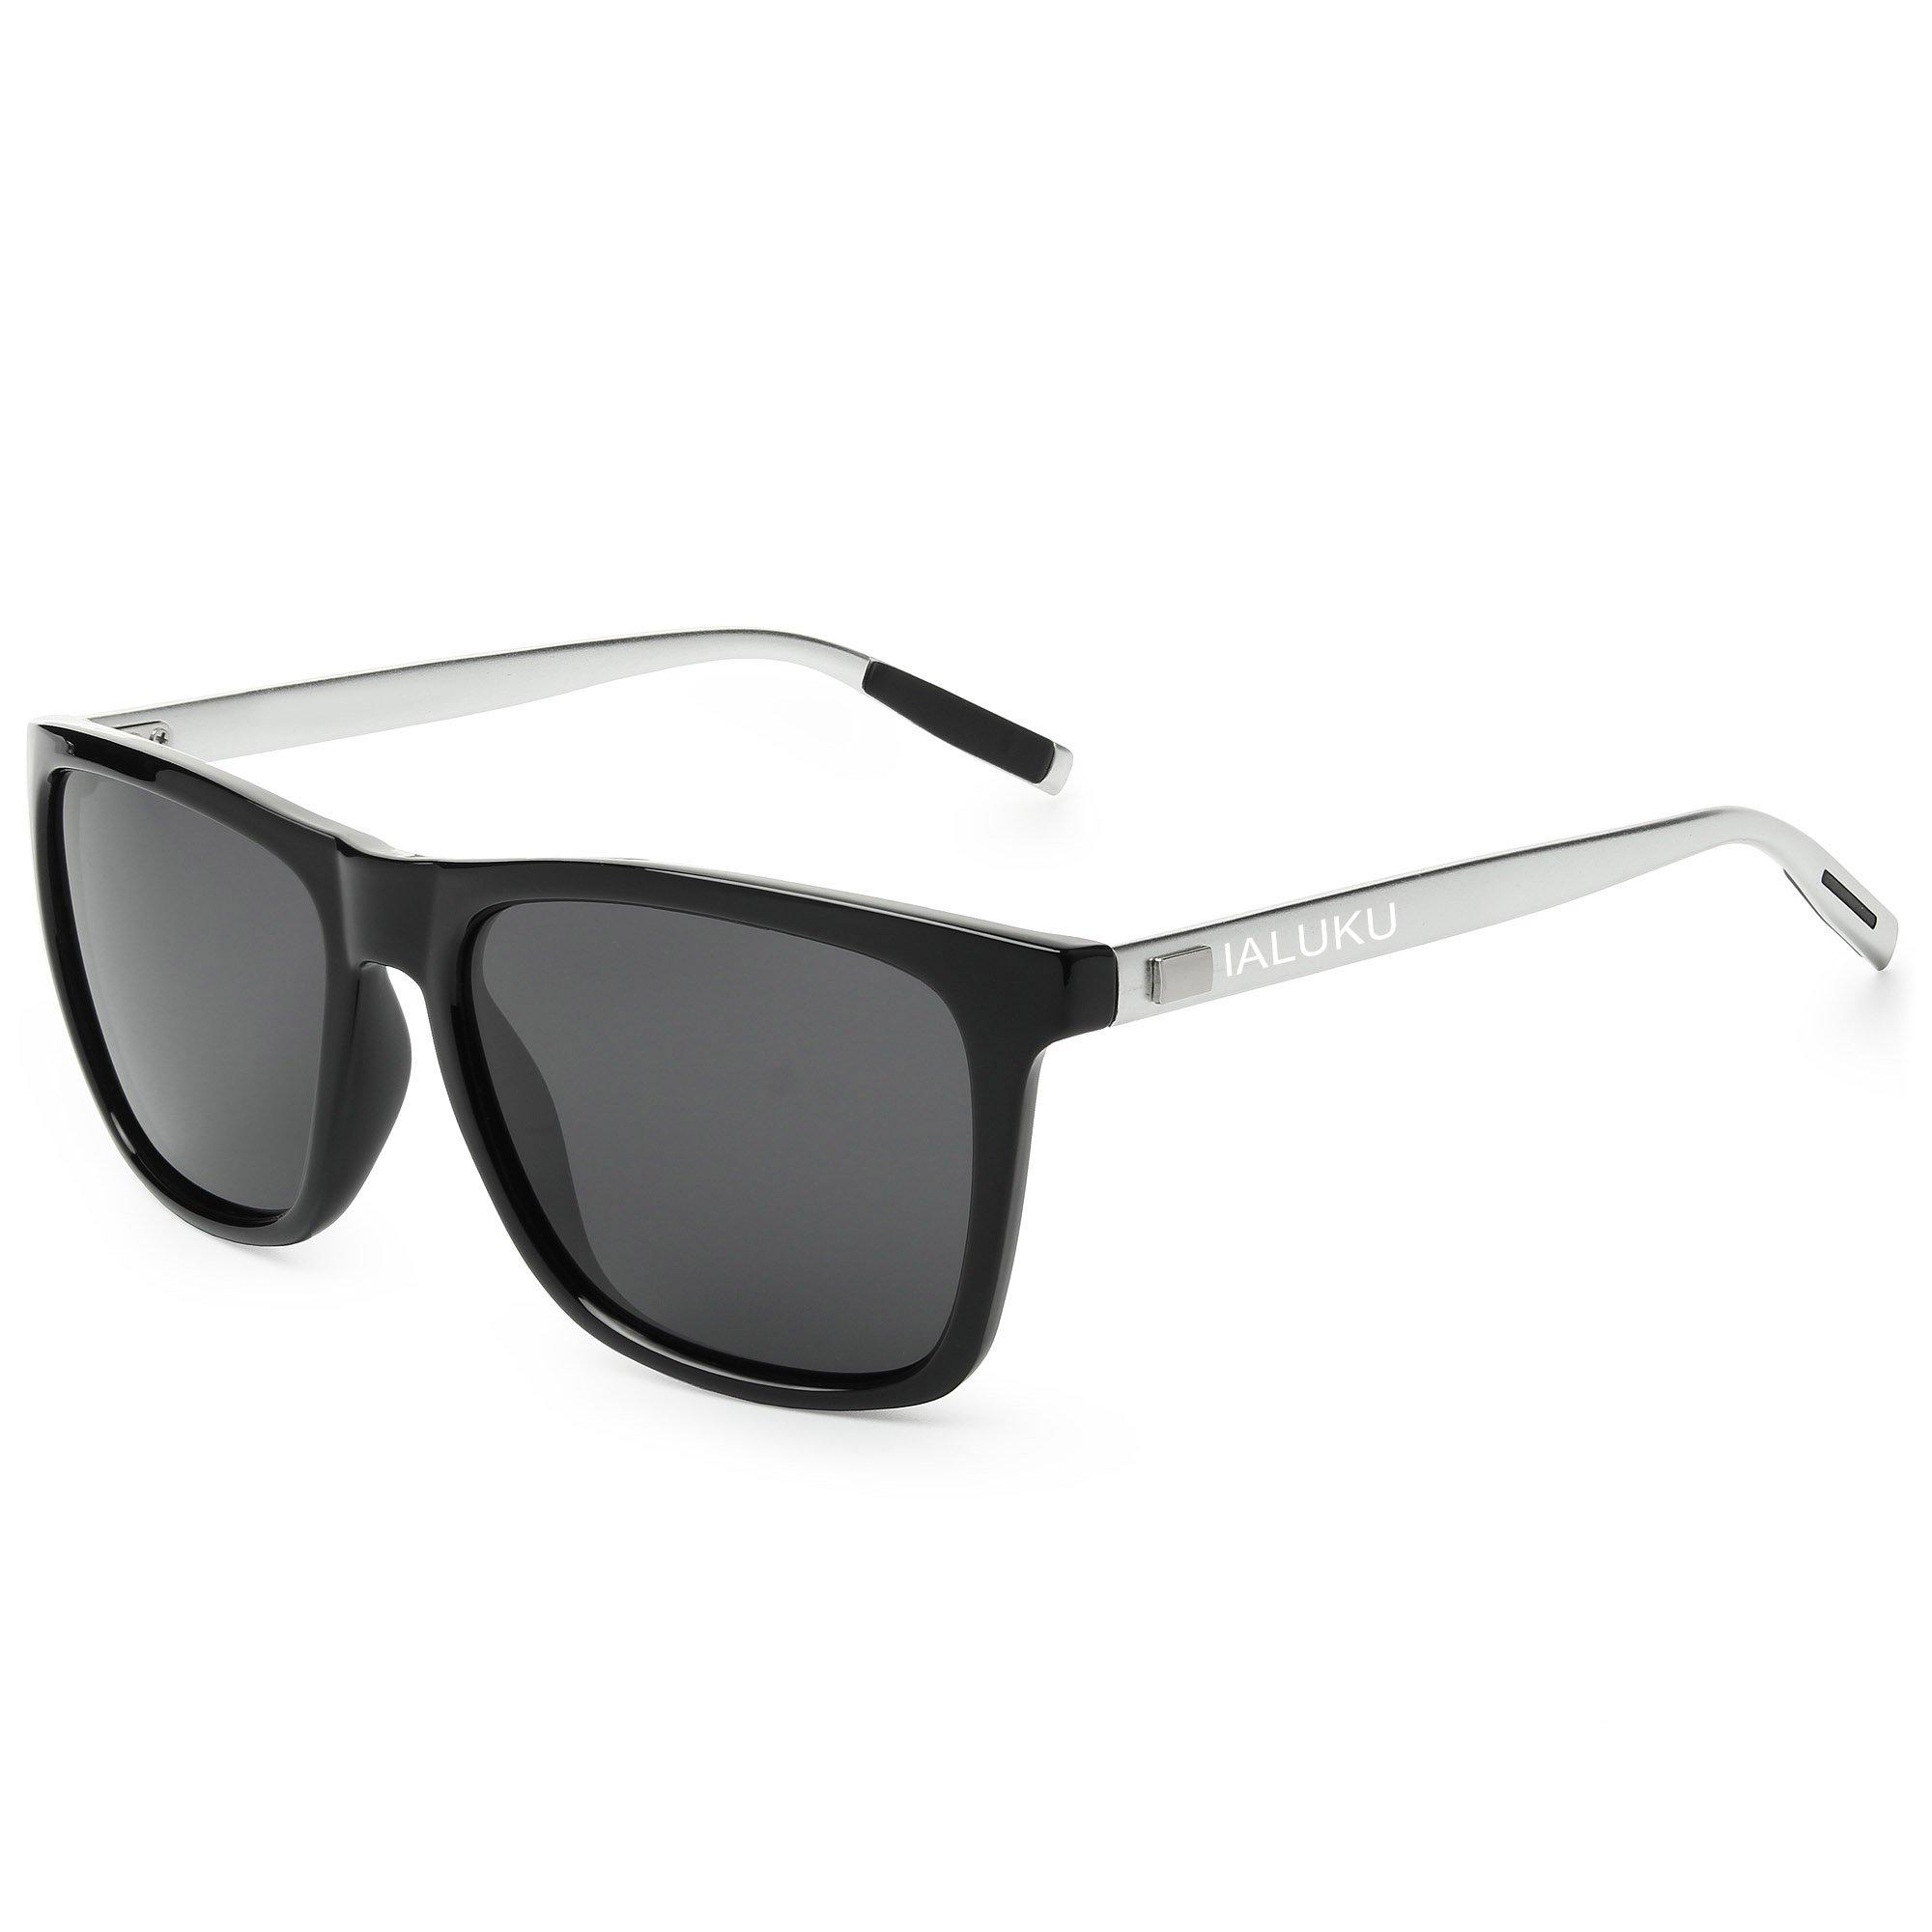 IALUKU Wayfarer Sunglasses Polarized Women Men Mirrored UV400 Full Frame (Black / Gray, 60)